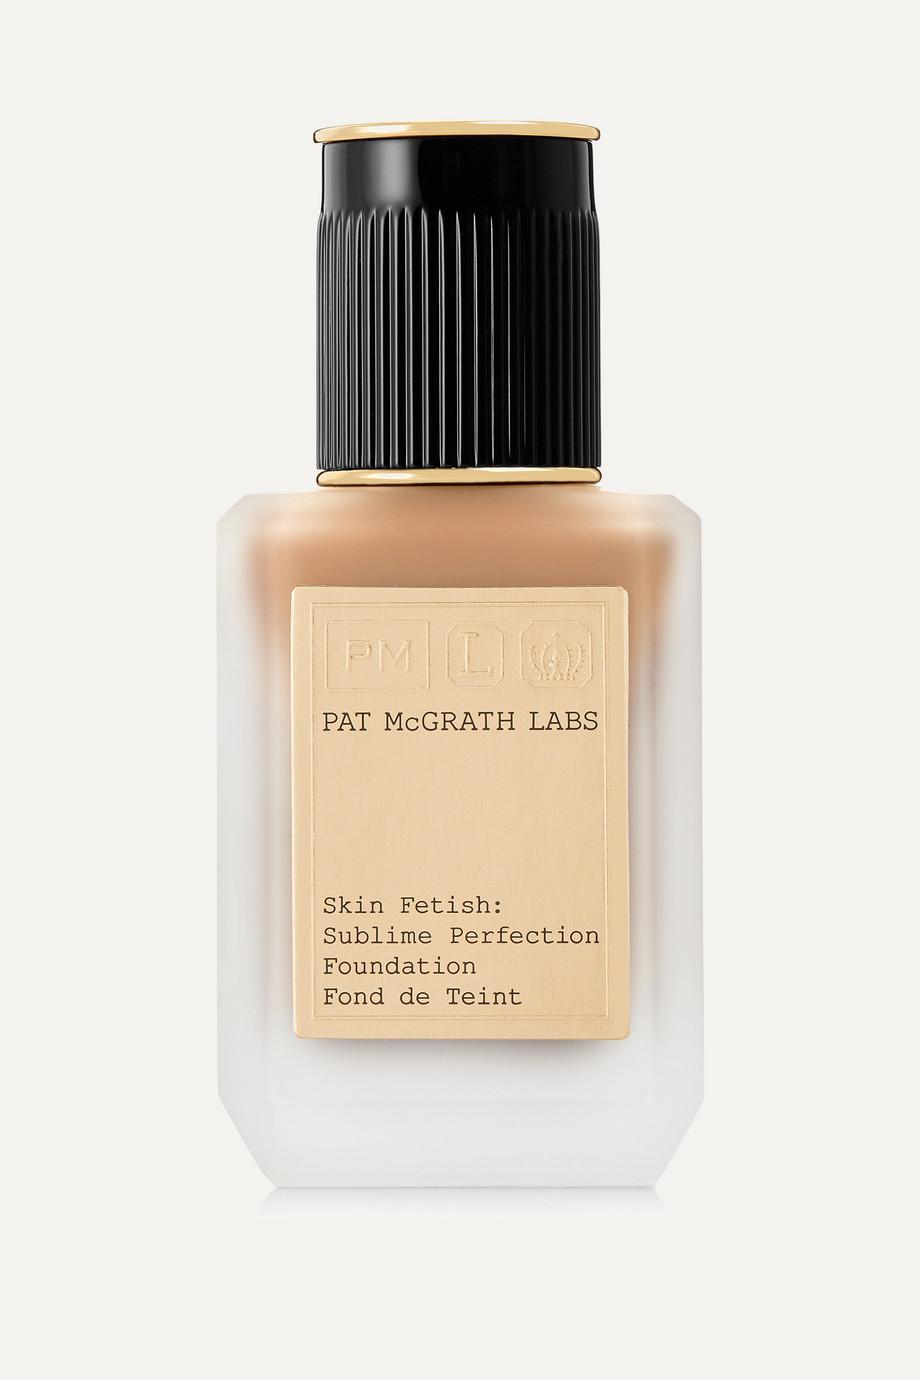 Pat McGrath Labs Skin Fetish: Sublime Perfection Foundation - Light Medium 14, 35ml